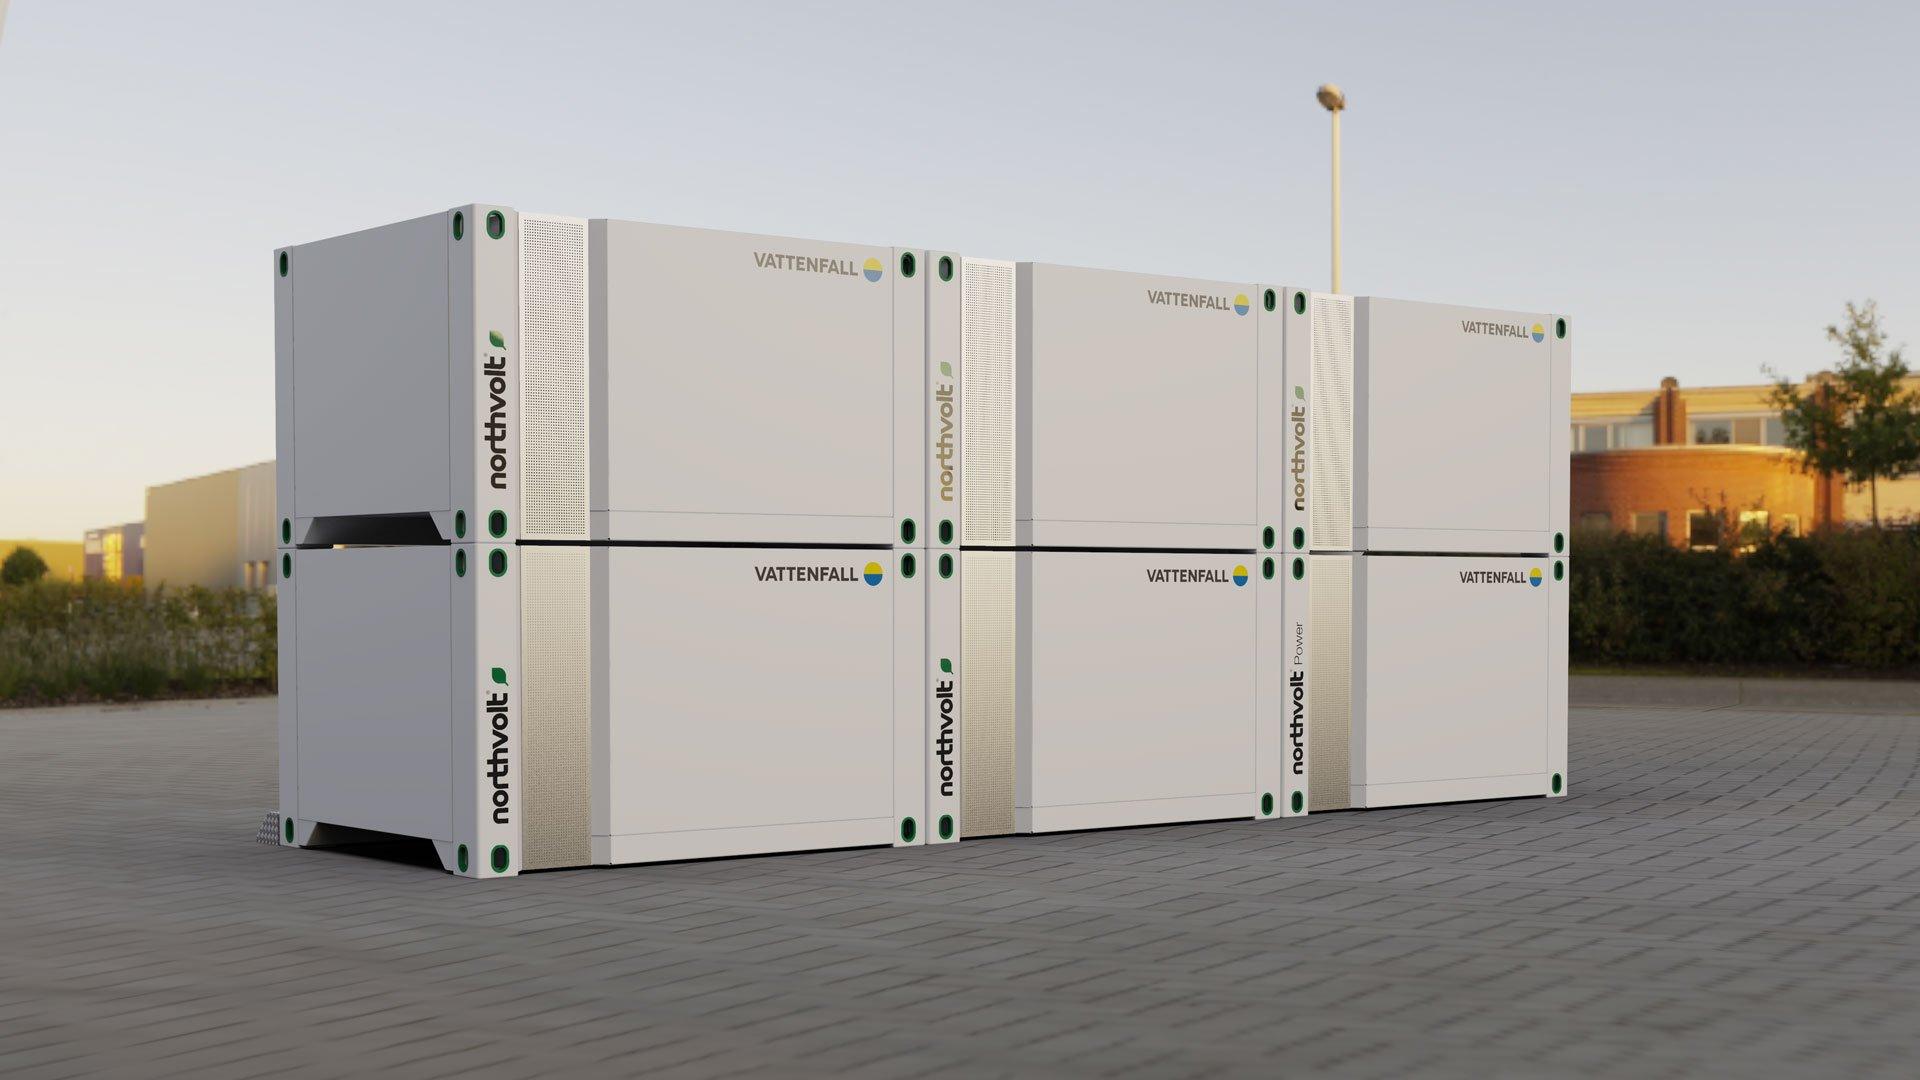 $2.75B Northvolt deal highlights record capital year for battery storage so far